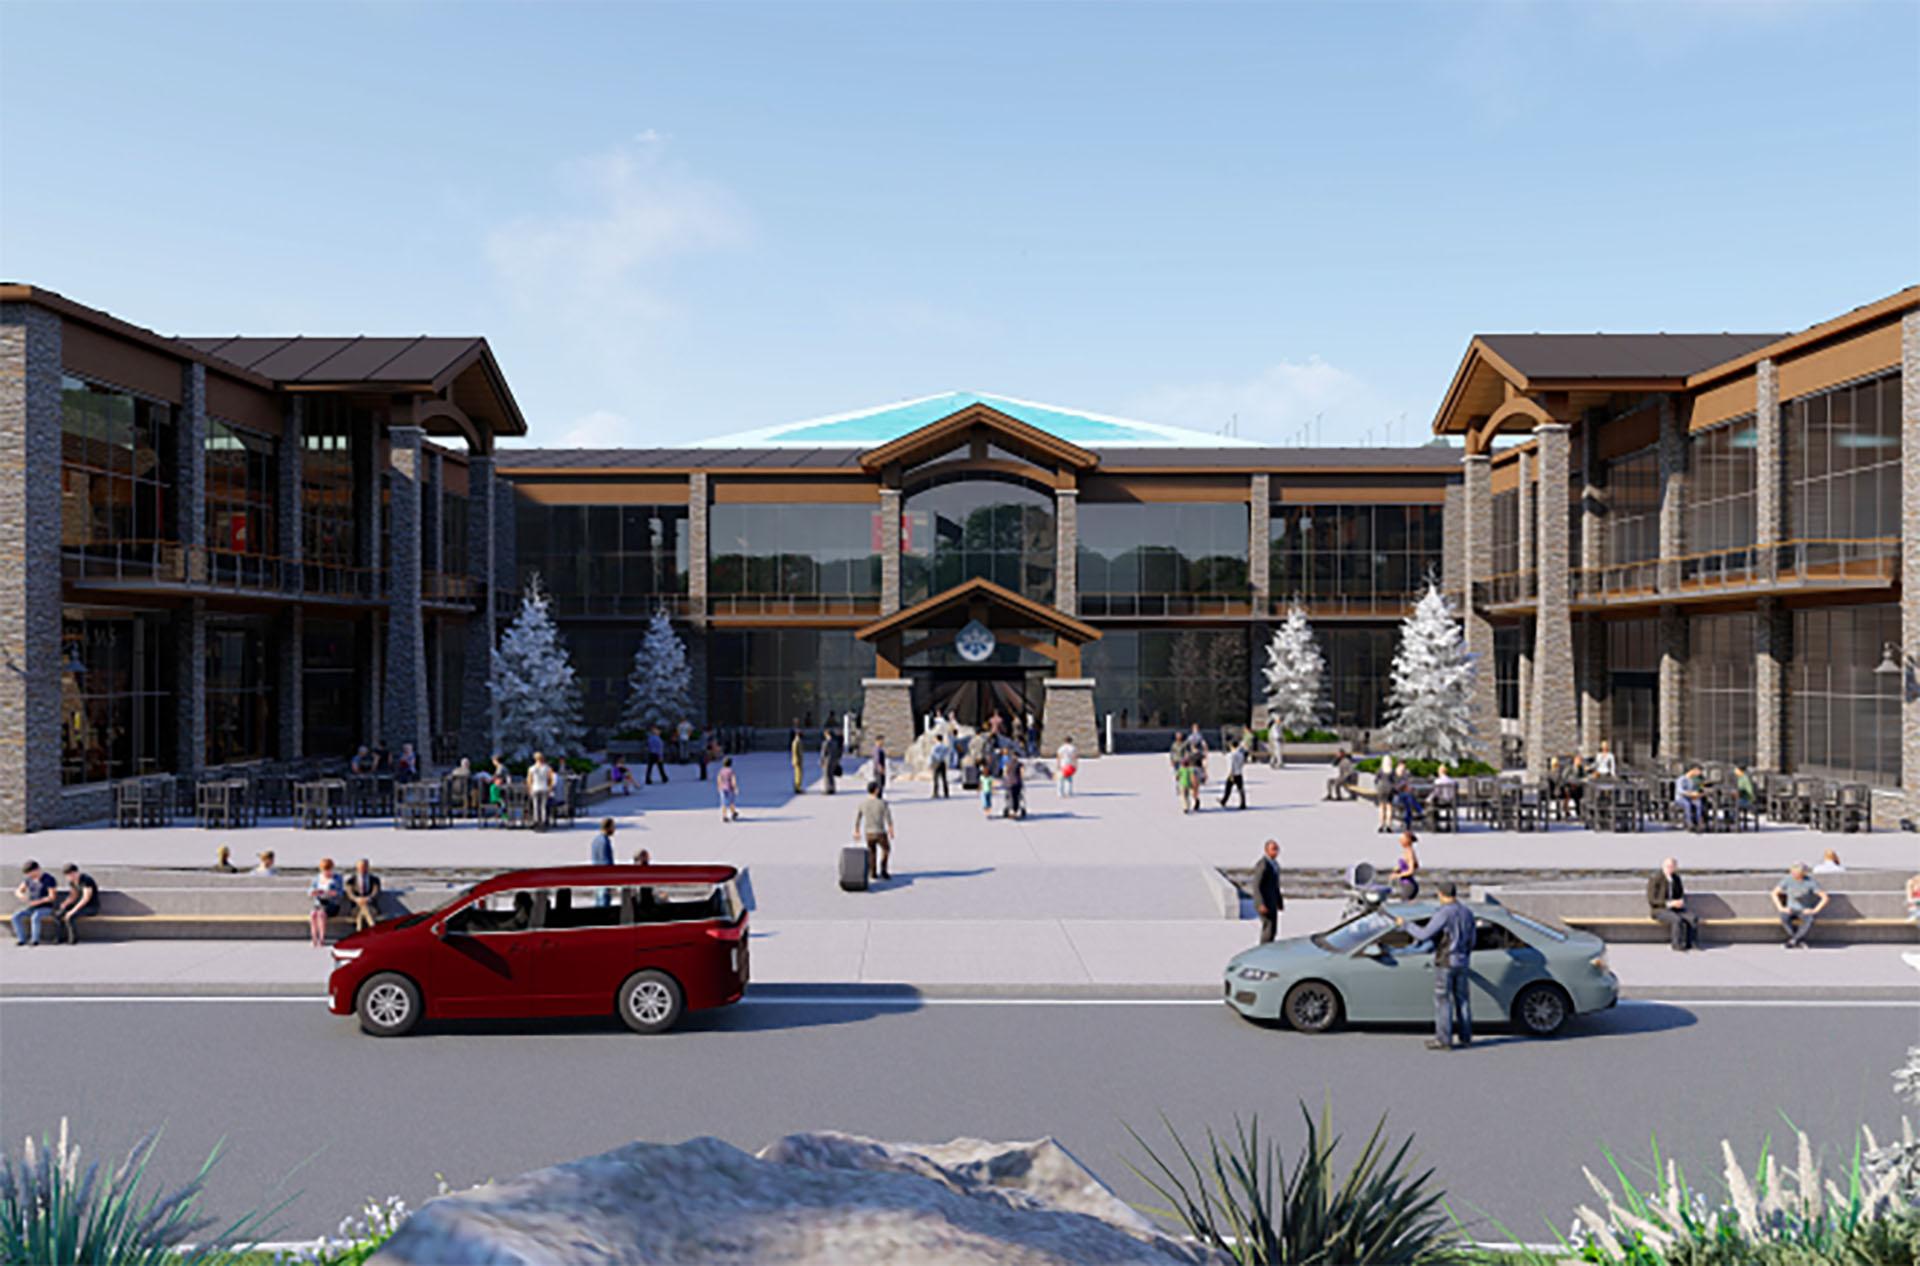 Indoor ski facility may be coming to Lorton